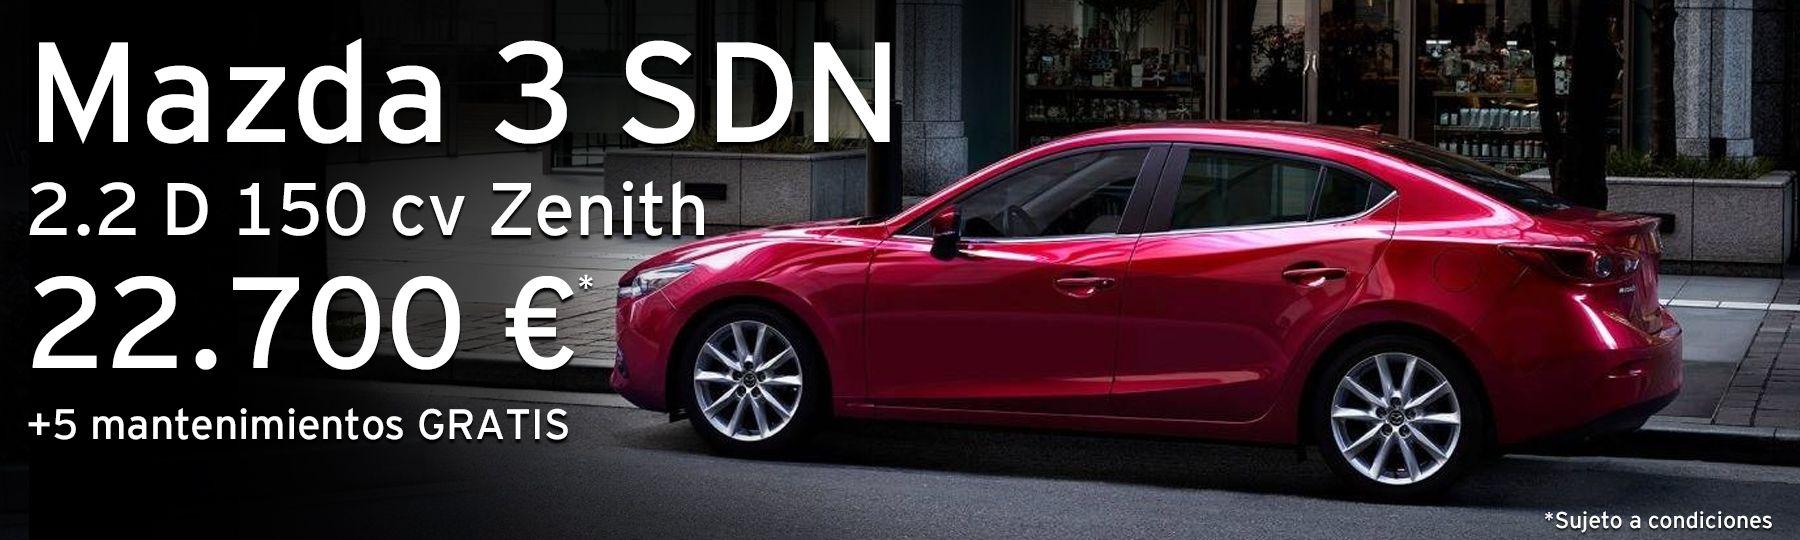 Mazda 3 Sedán 2.2 D 150 cv Zenith